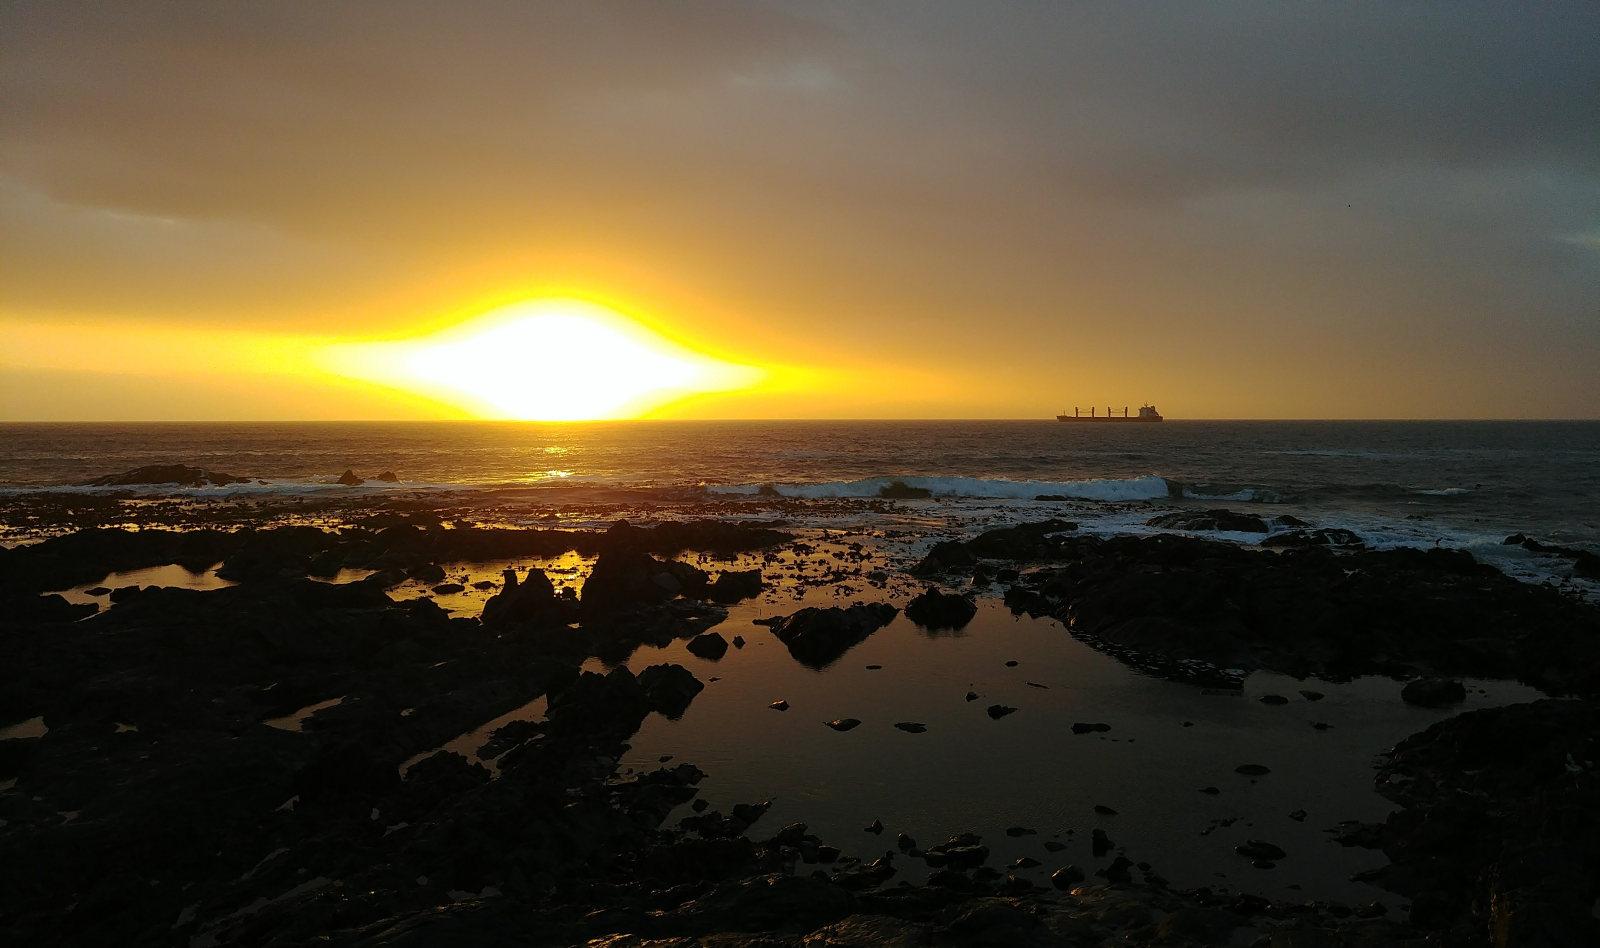 A photo of the sun.